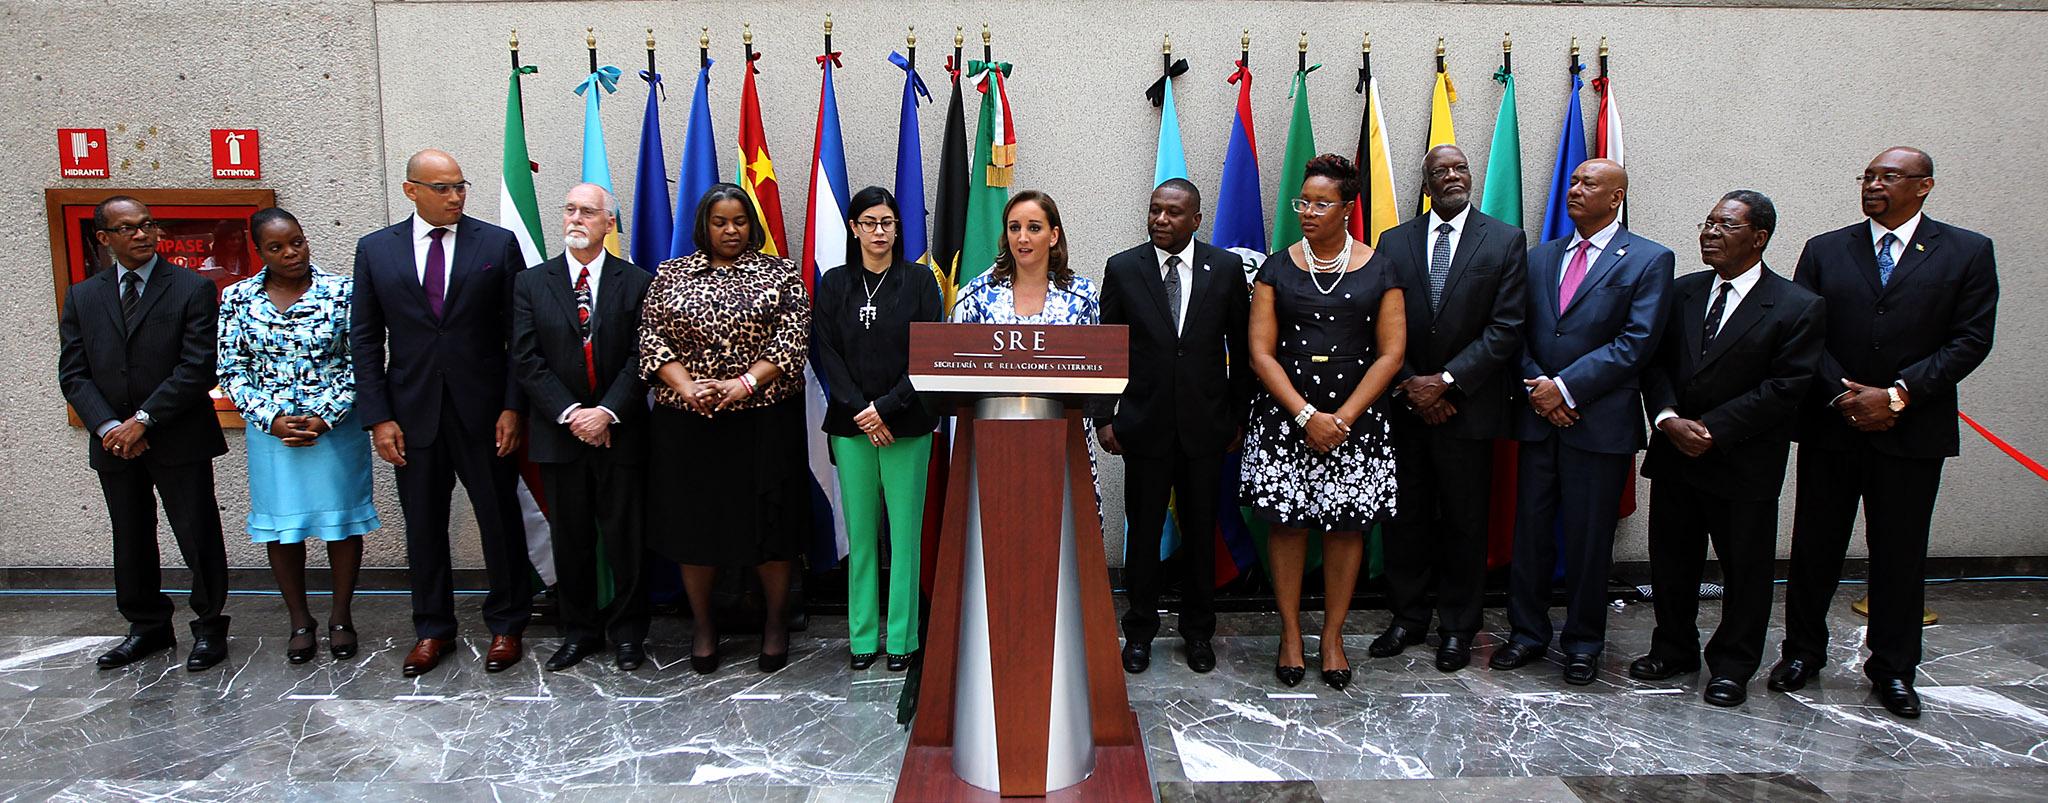 La canciller Claudia Ruiz Massieu inauguró oficina para embajadas concurrentes del Caribe